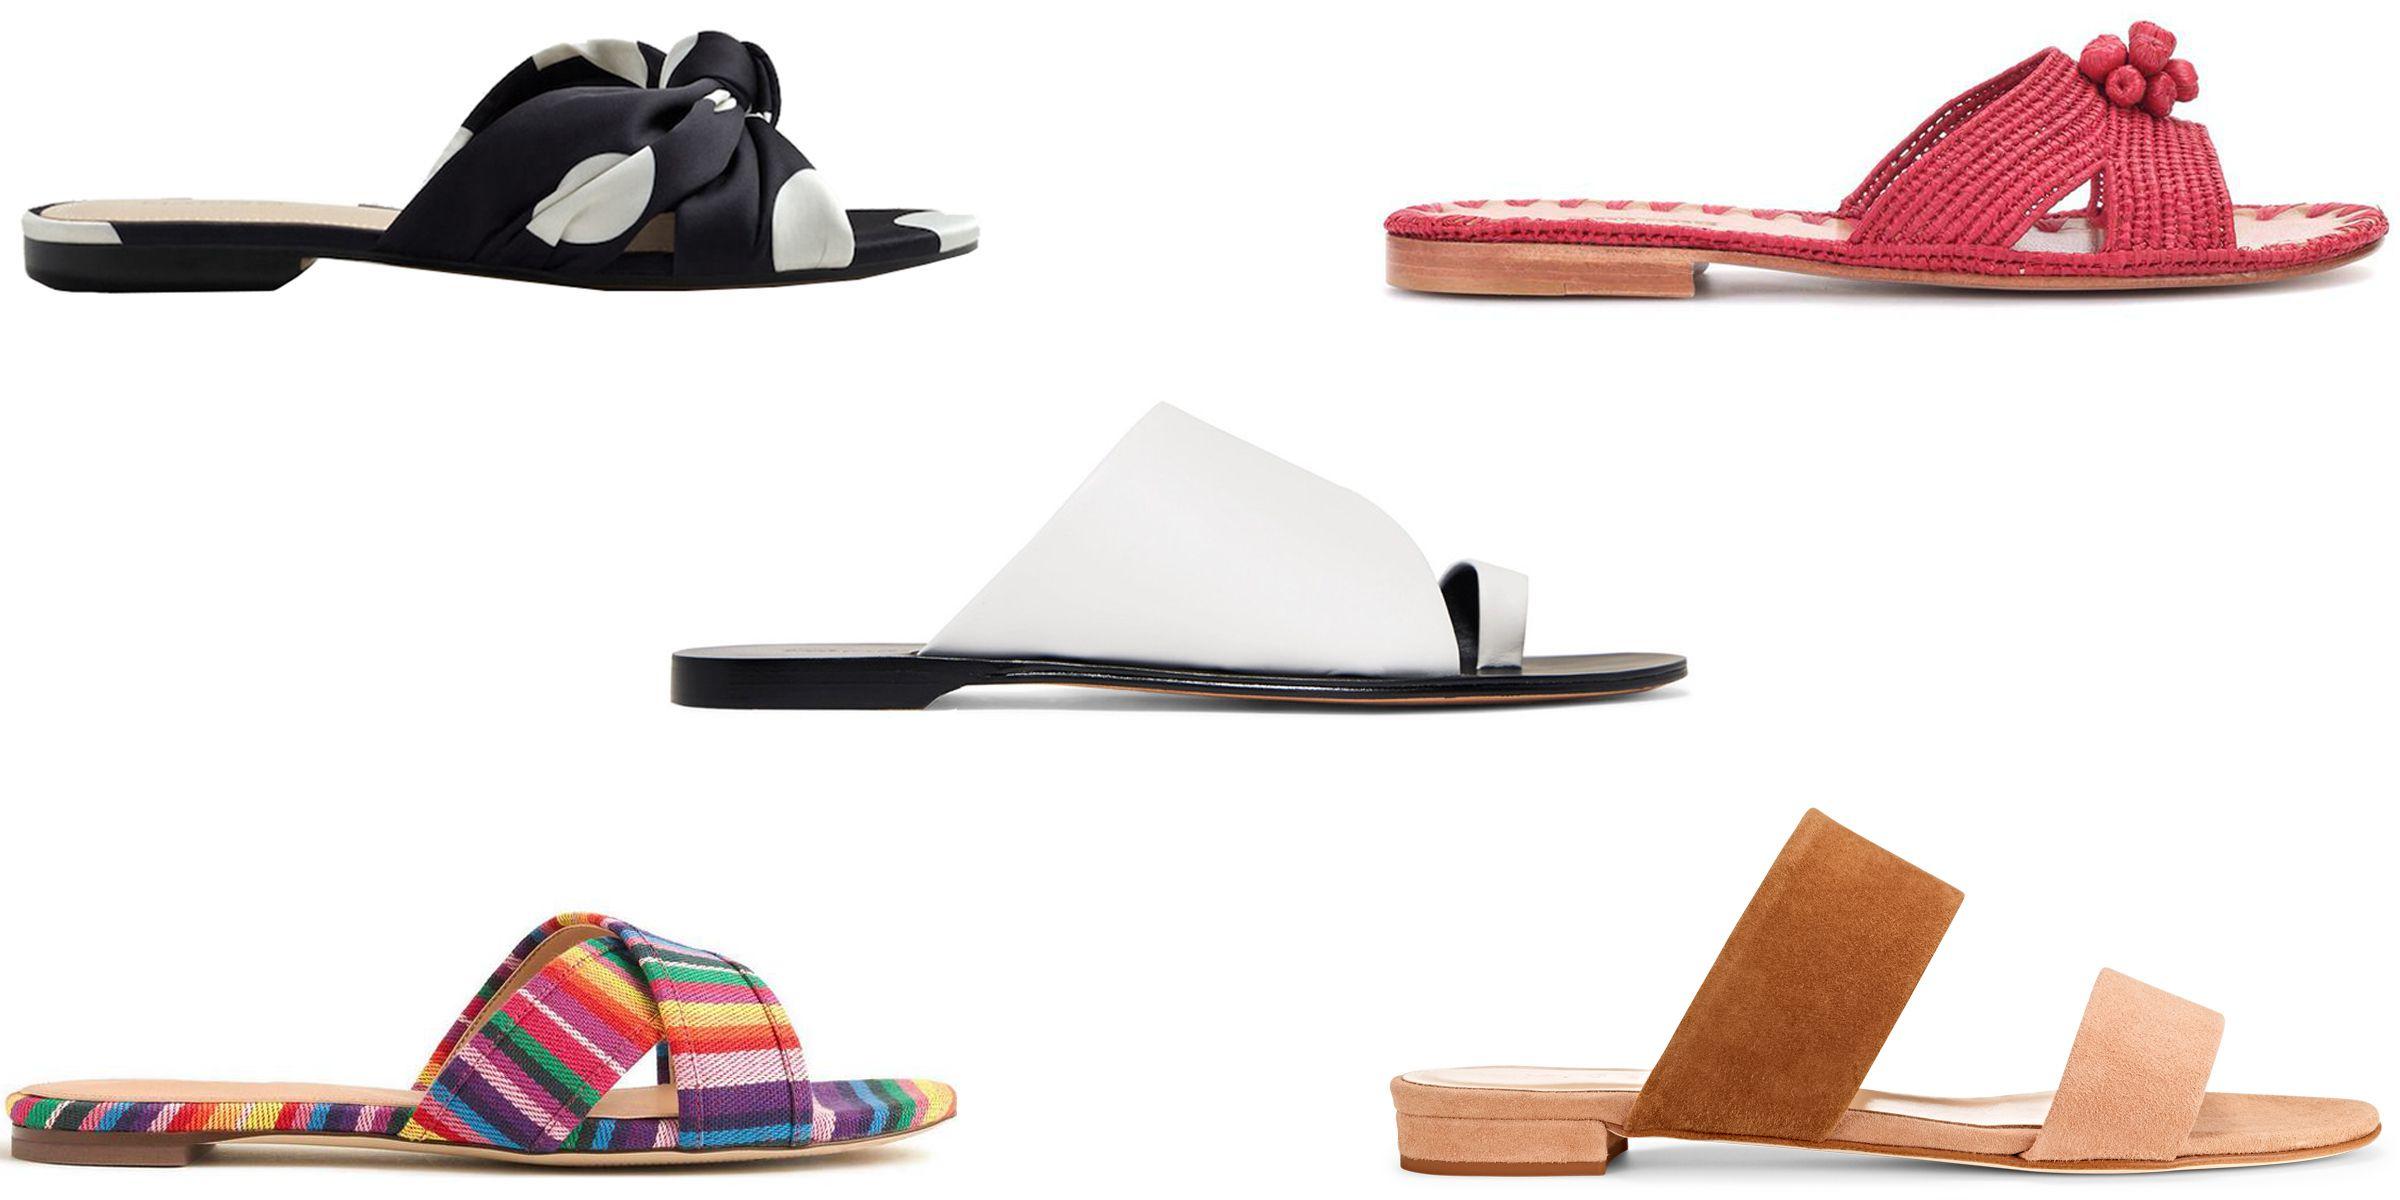 Best Flat Sandals for Summer 2018